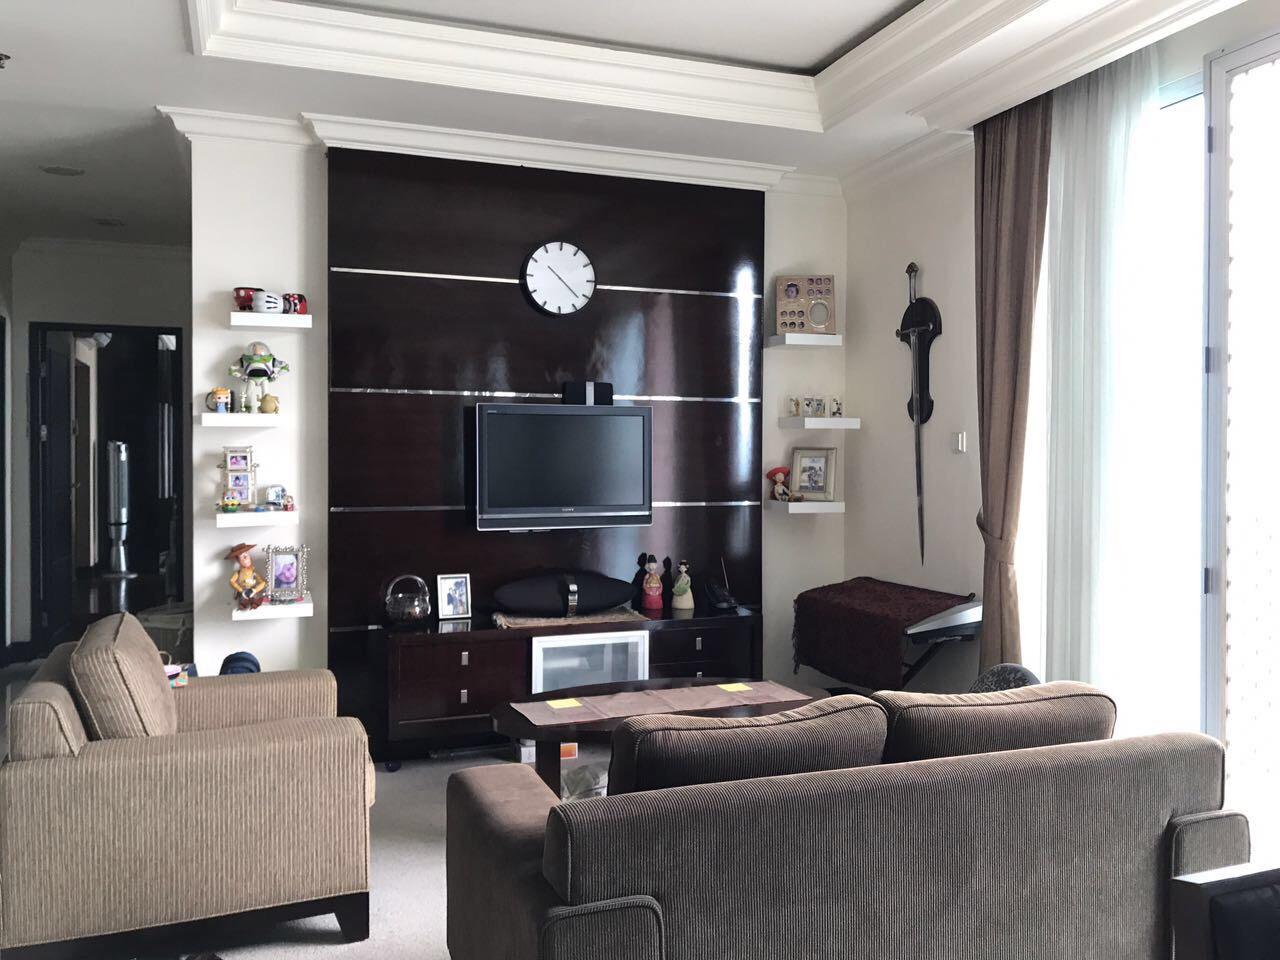 Apartemen Eminence Dharmawangsa 3 bedroom